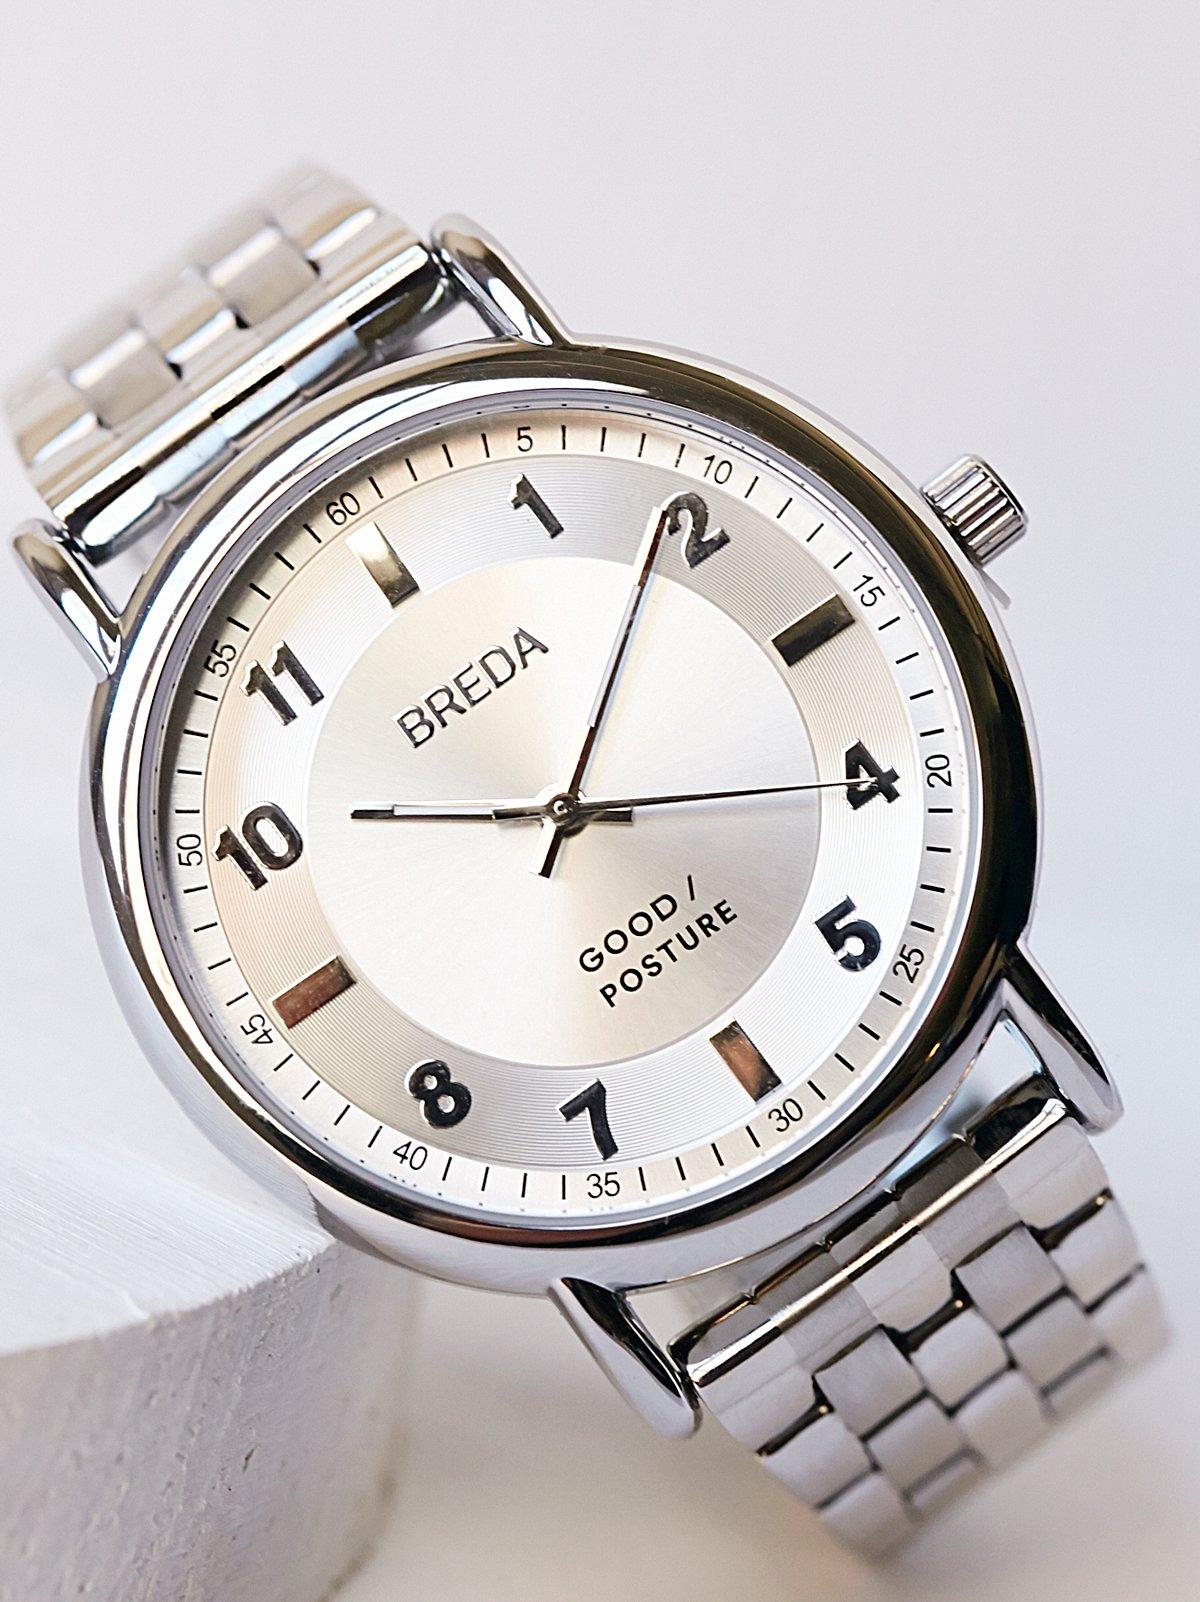 Blossom金属带腕表